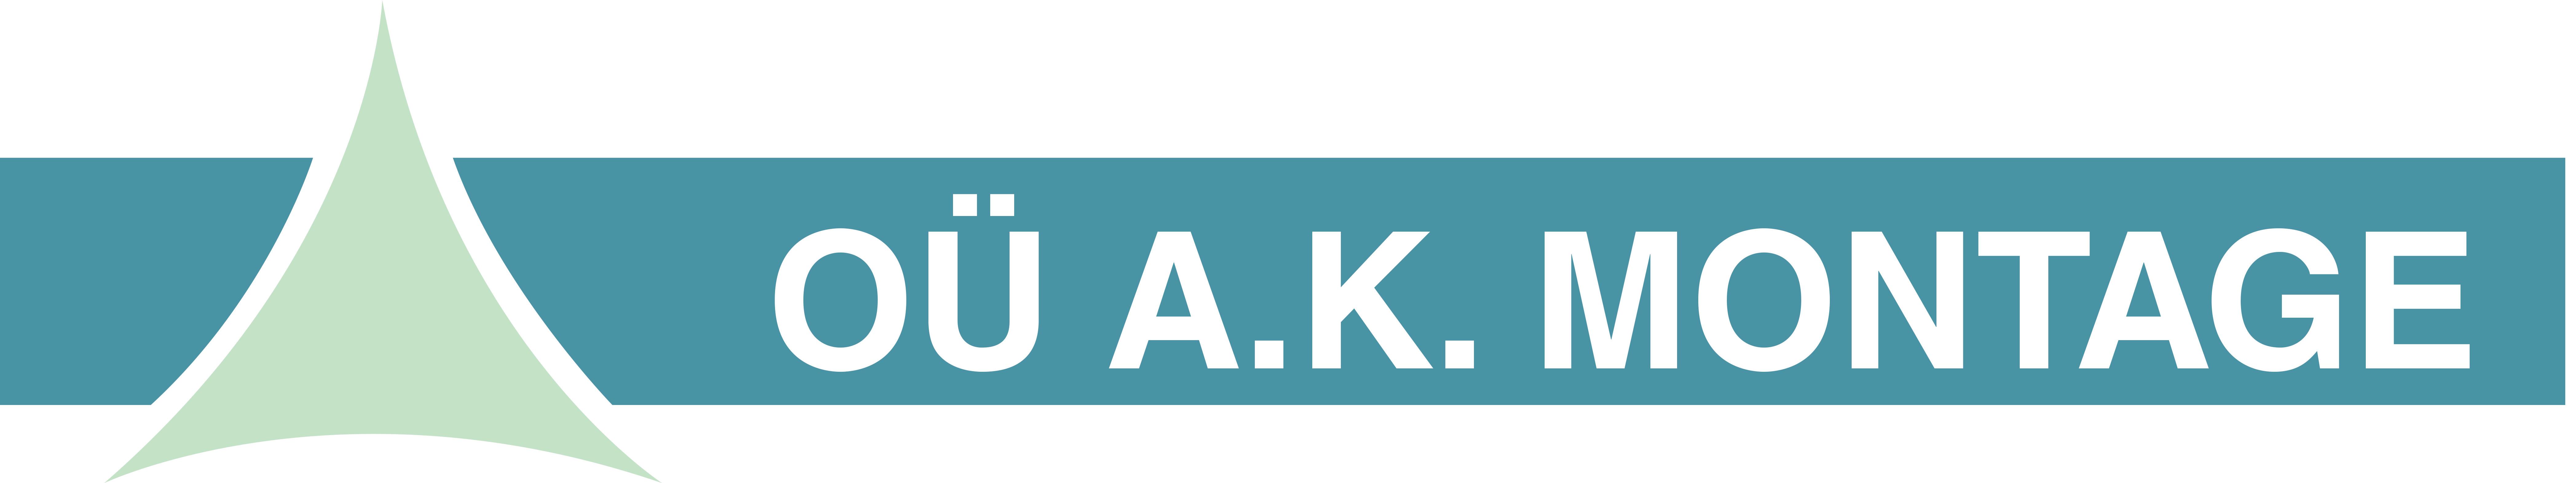 A.K.Montage OÜ